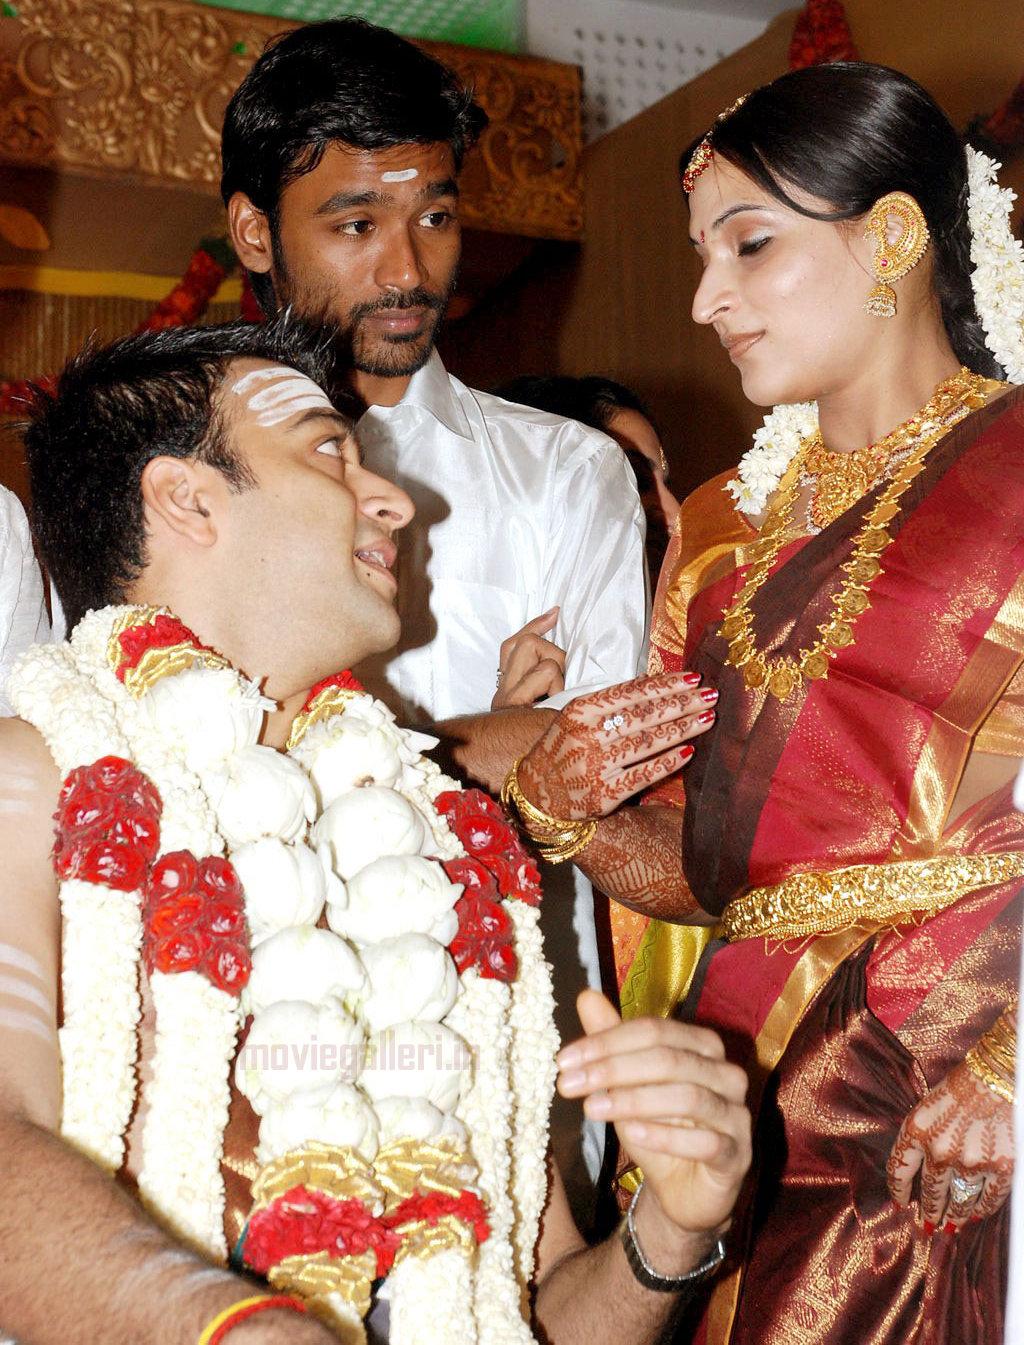 Dhanush and aishwarya wedding